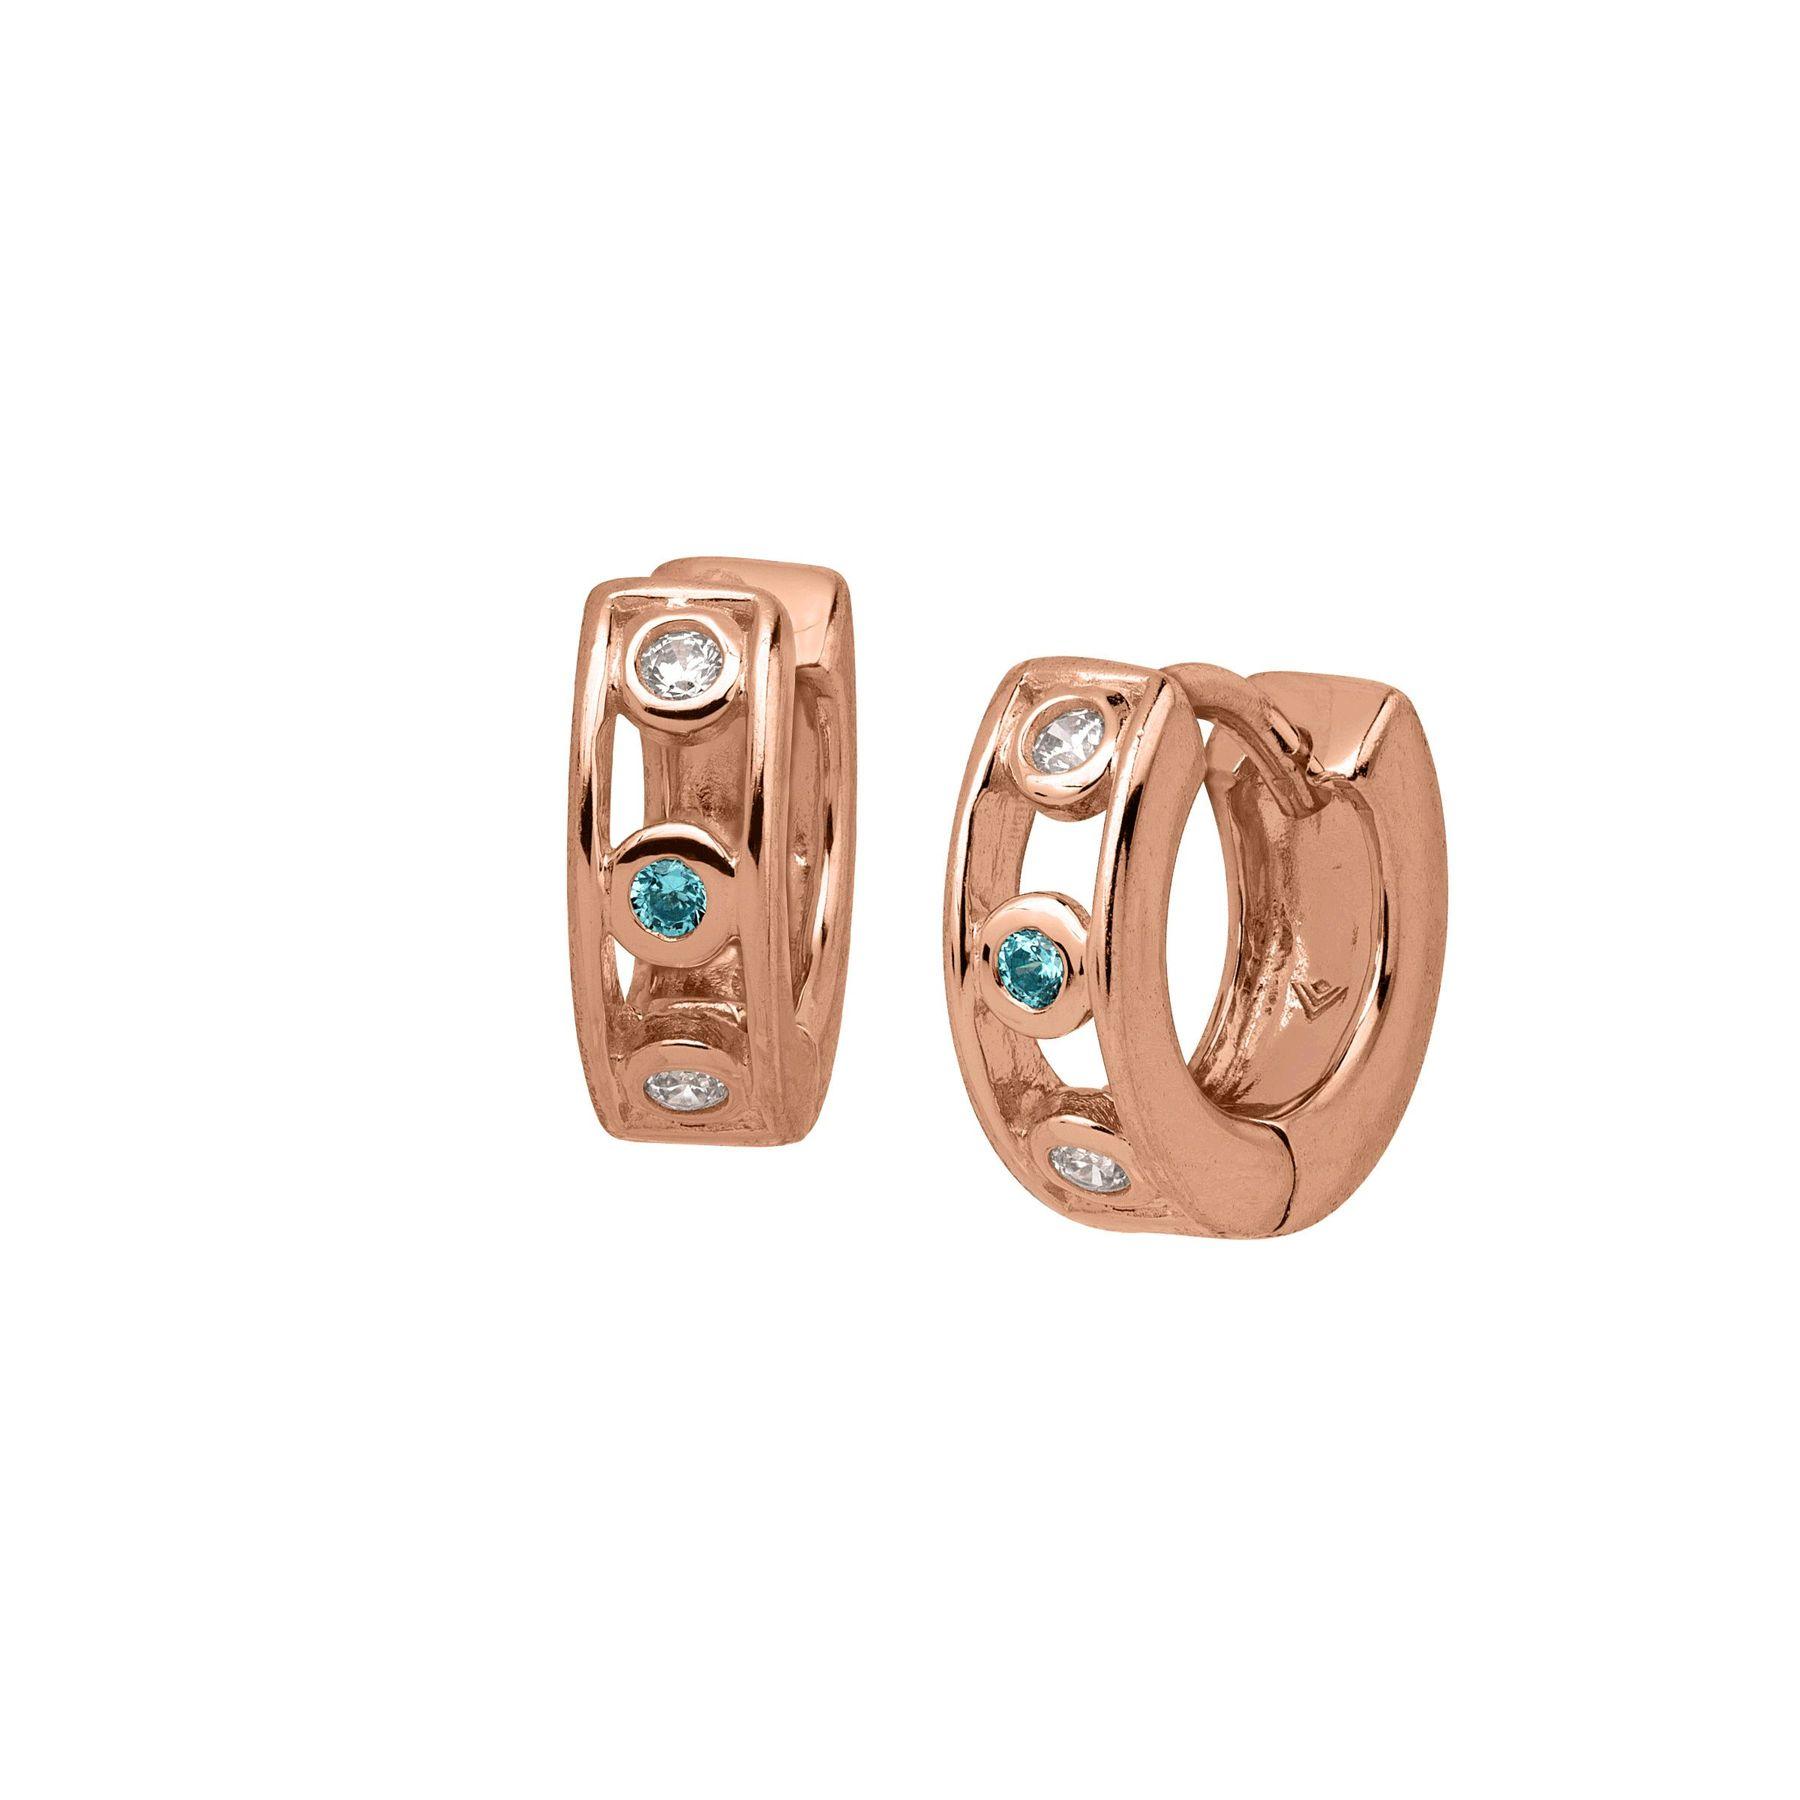 f1b088154 Silpada 'Soleil' Studded Huggie Hoop Earrings with Cubic Zirconia in 18K  Rose Gold-Plated Sterling Silver | Soleil Studded Huggie Hoops | Silpada